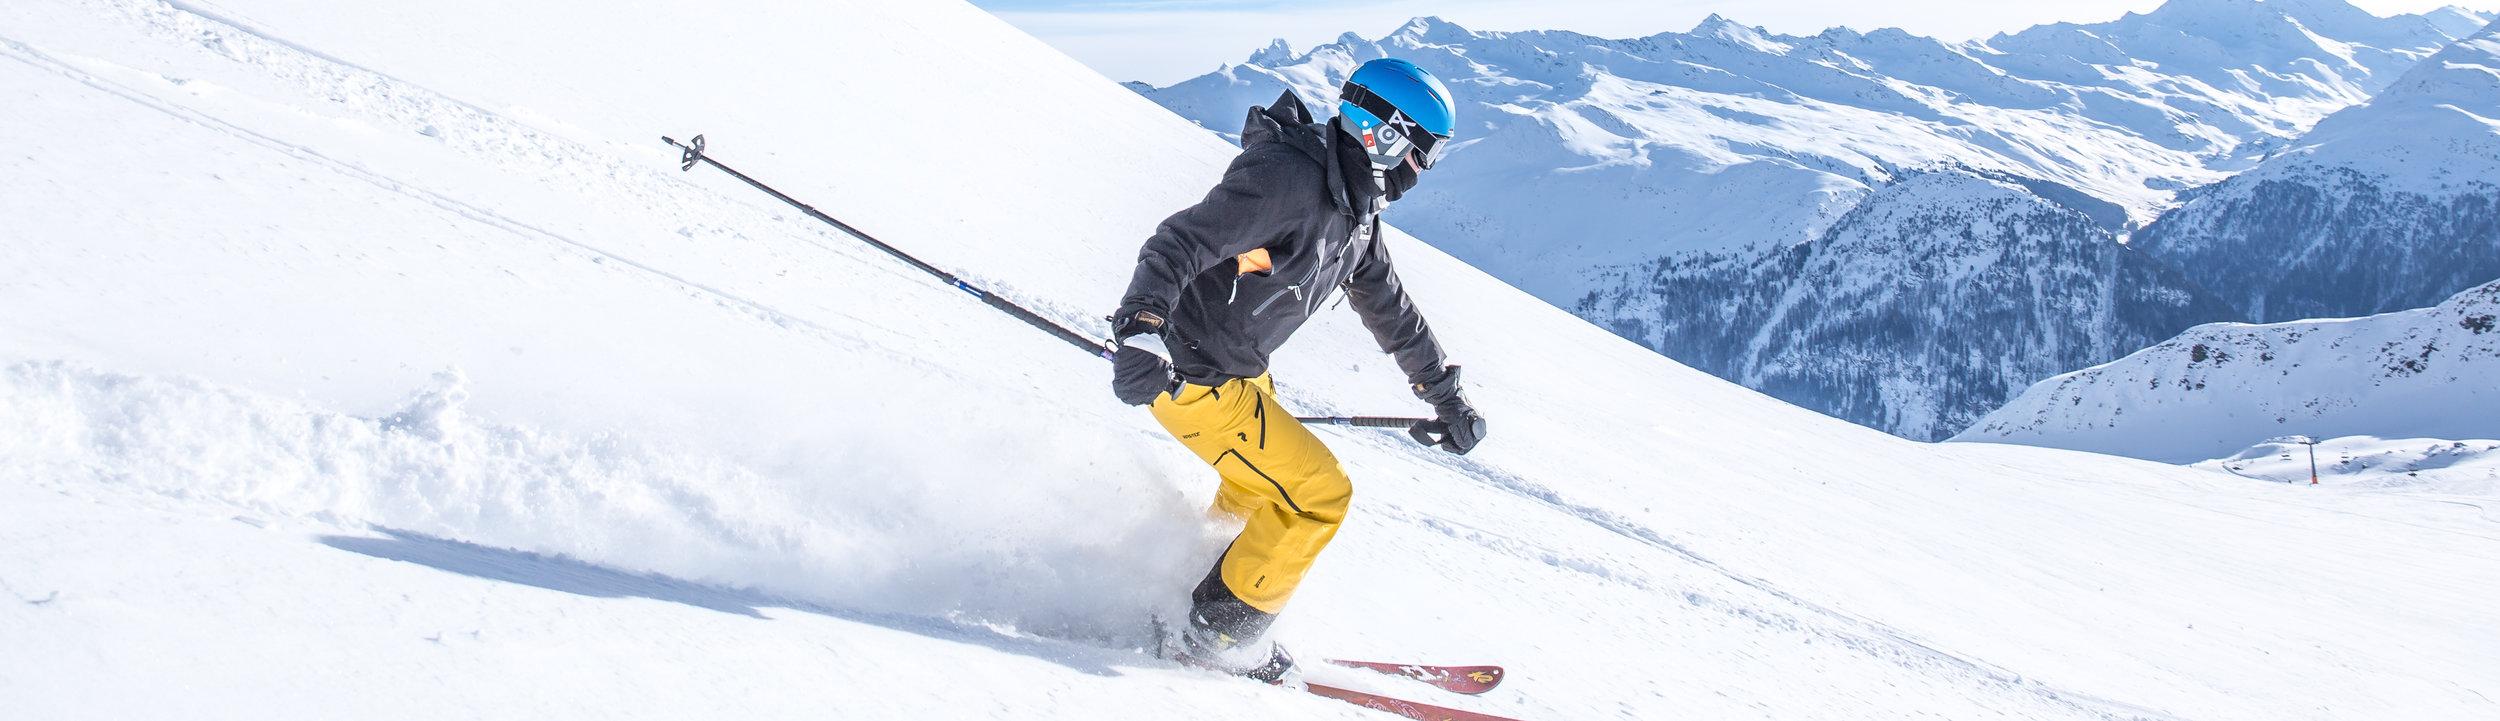 RECENT: SNOW SPORTS -